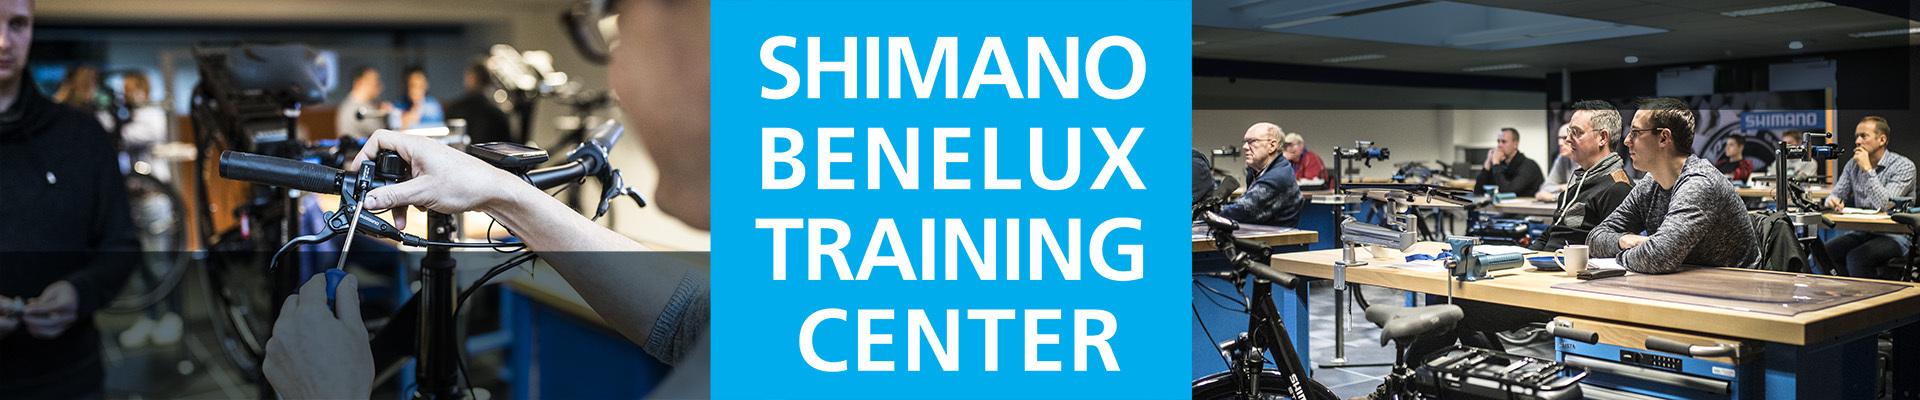 Shimano Benelux Training Center 2019 - 2020